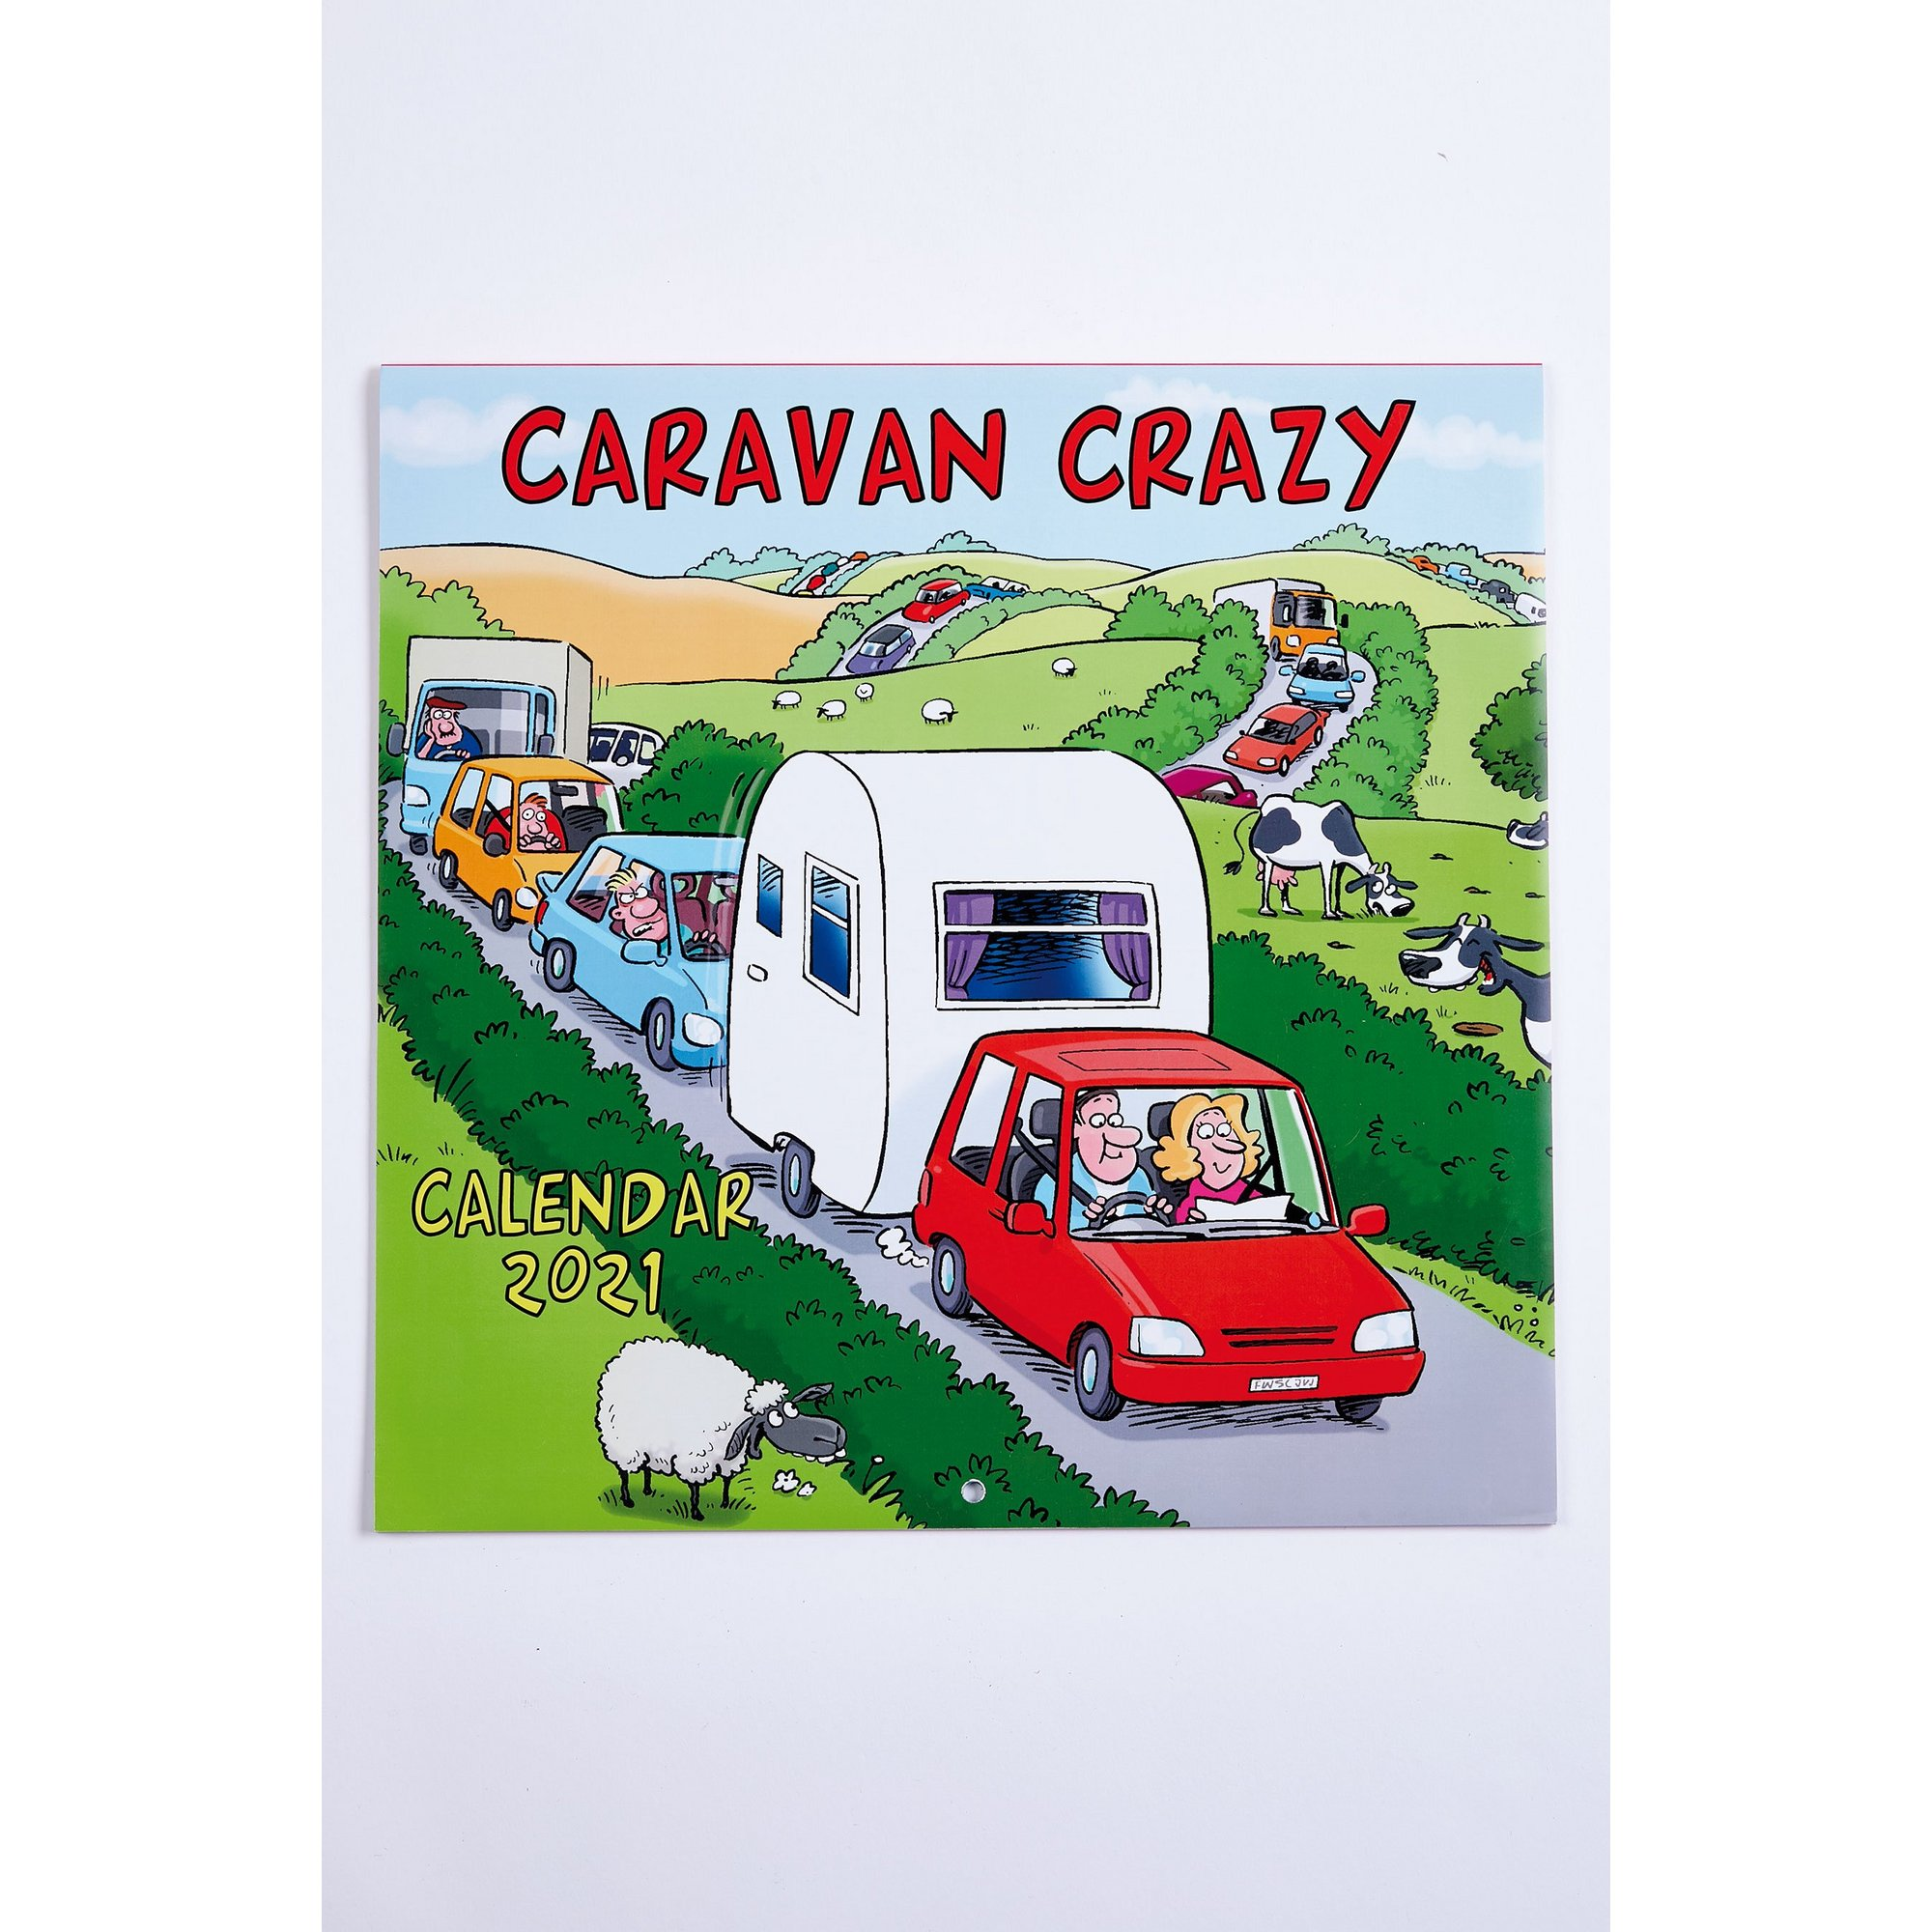 Image of Caravan Crazy Calendar 2021